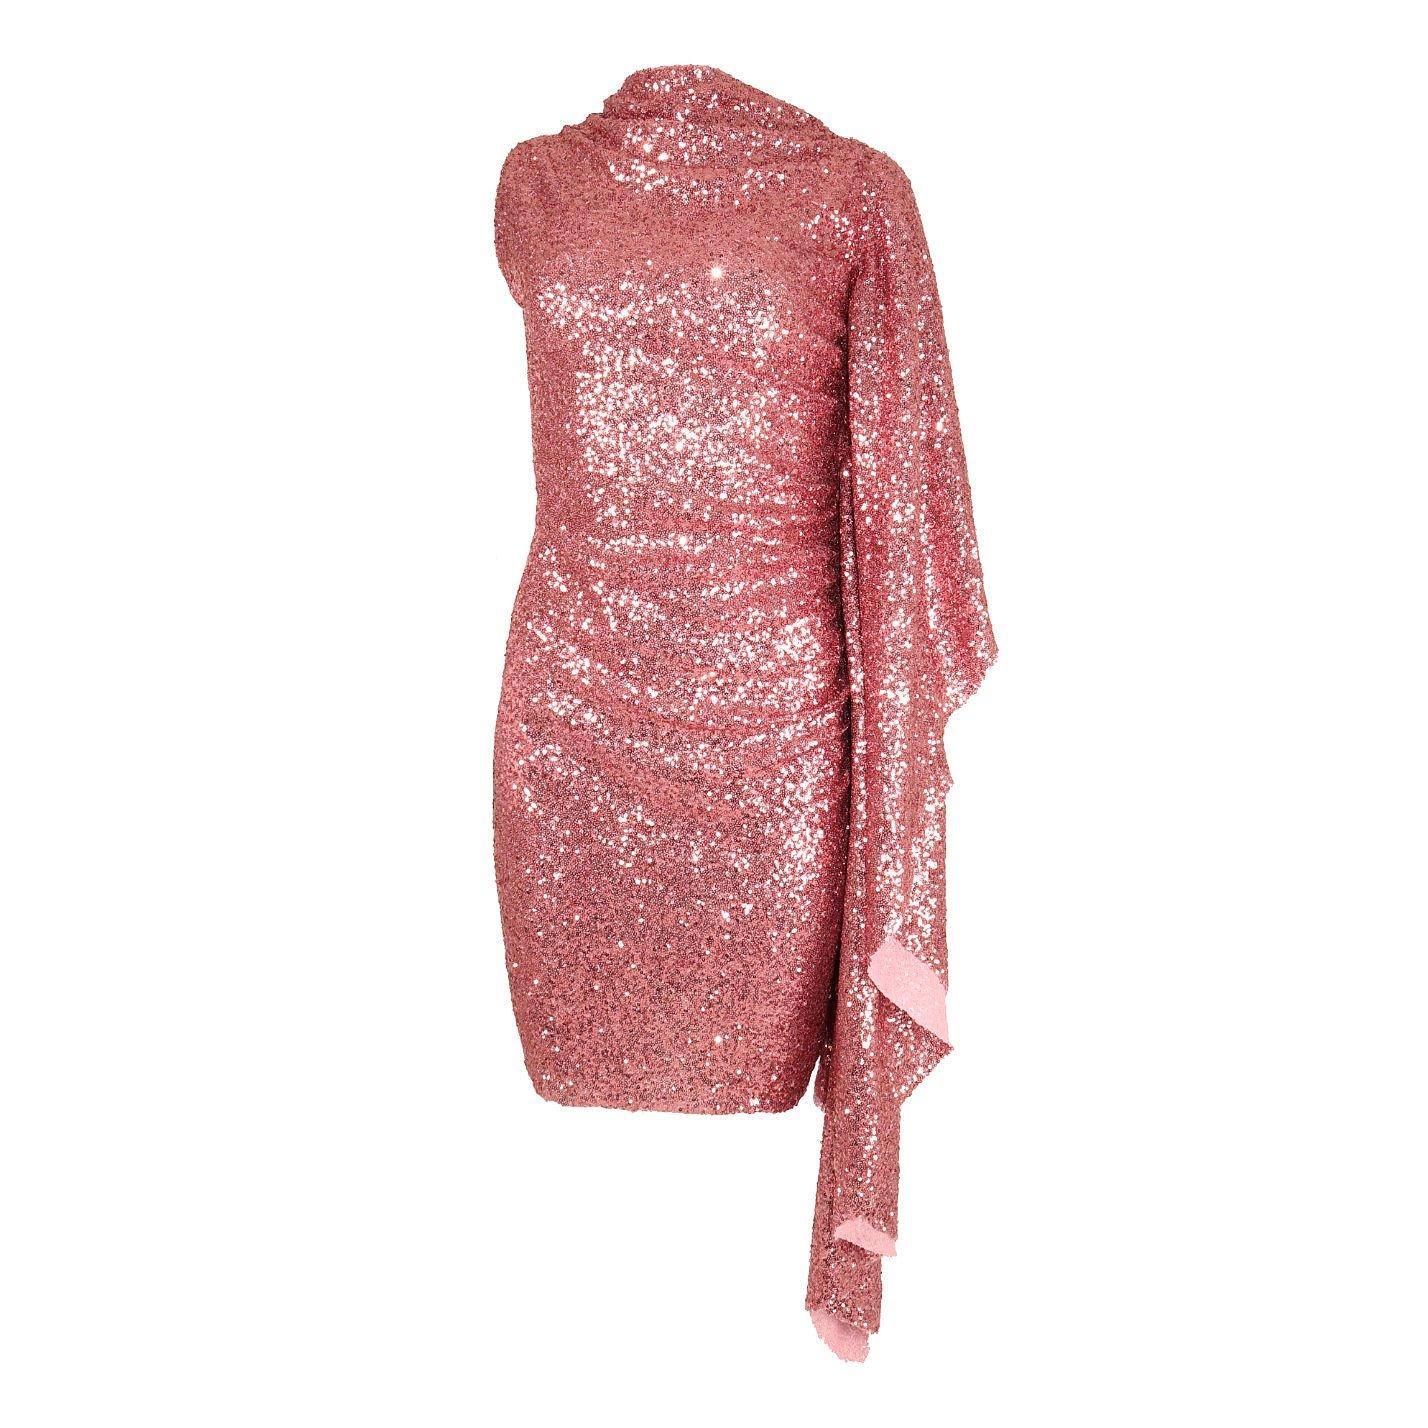 Paula Knorr Relief Ruffled Sequin Mini Dress